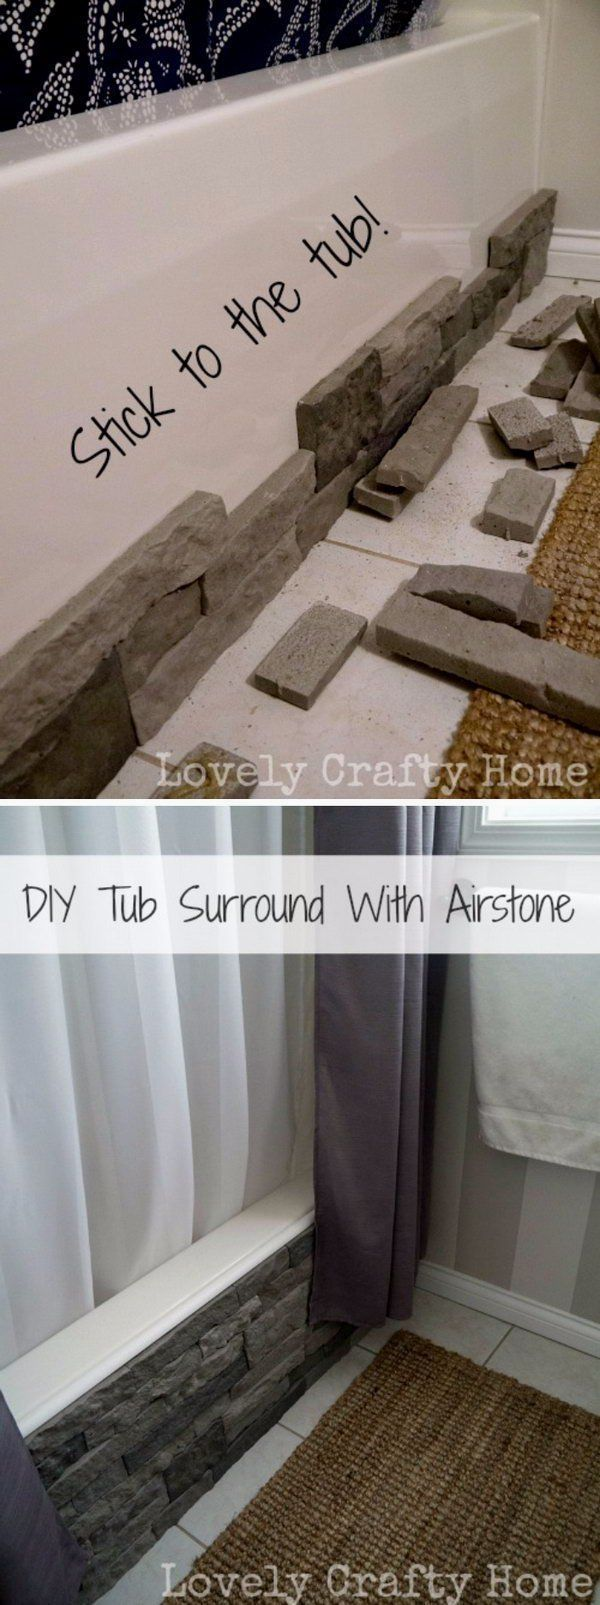 Erika Saiza saved to Bathroom/ vanity decor ideas/diysDIY Update Your Boring Builder Bathtub With Airstone. #homedecor #bathroomideas #bathroompalletprojects #SmallBathrooms